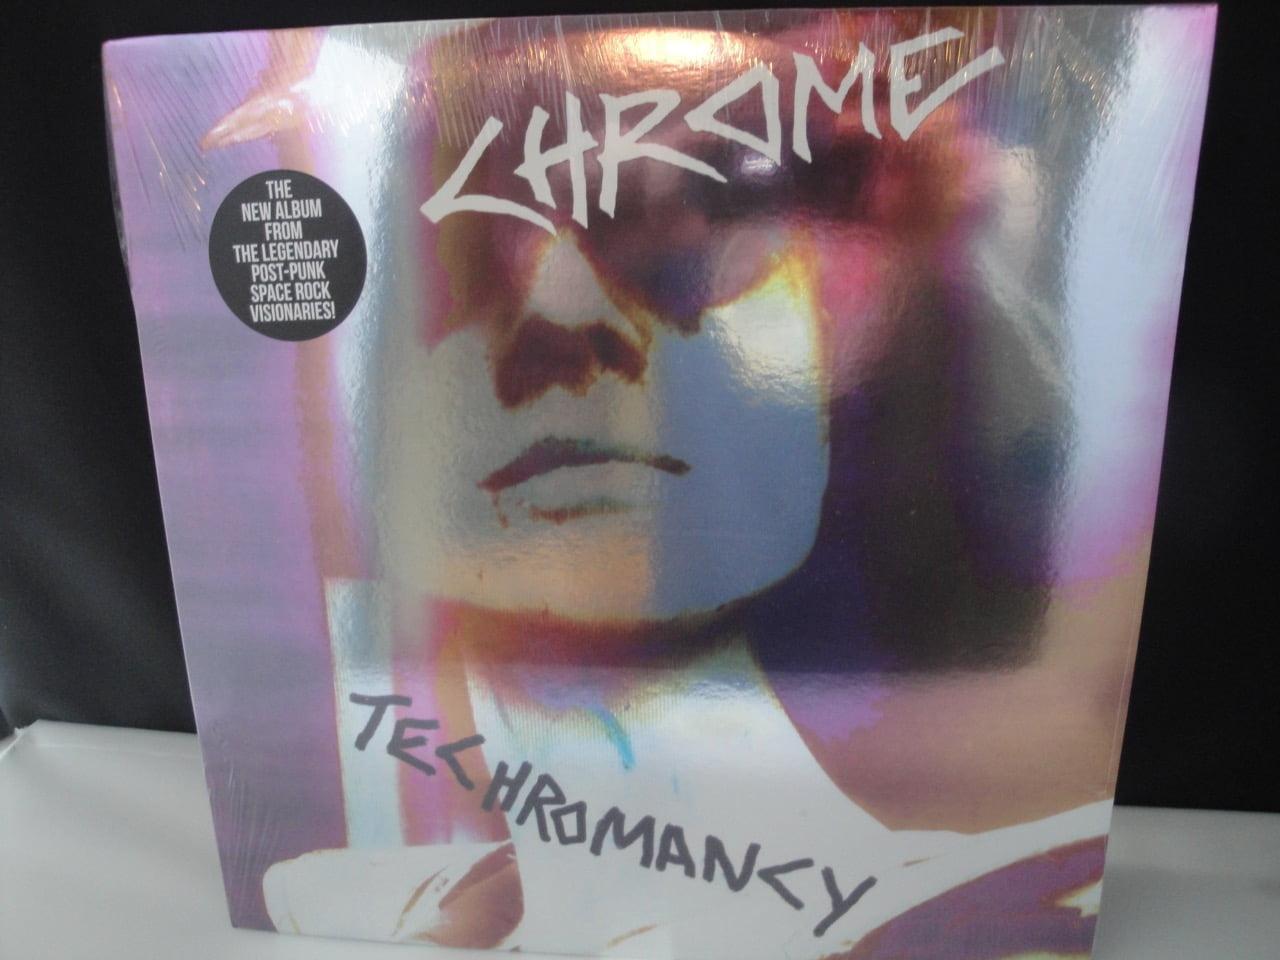 Chrome - Techromancy - Ltd Ed Clear Vinyl - Cleopatra Records 2017